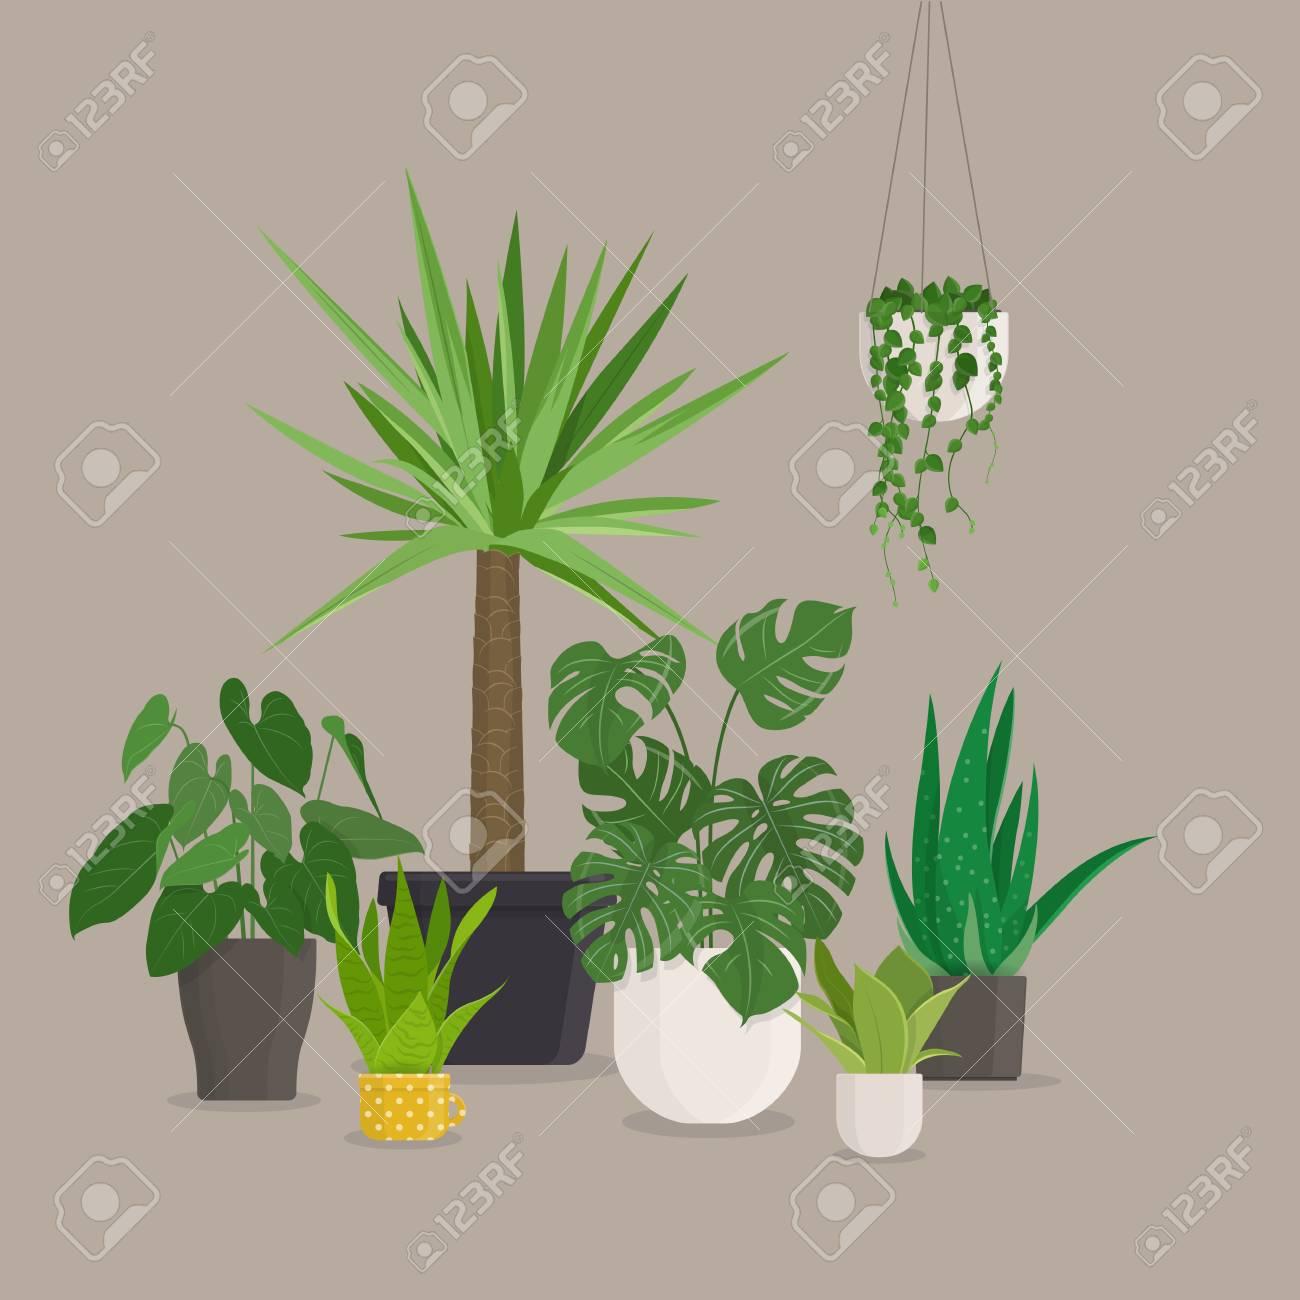 Set Of Green Indoor House Plants In Pots. Vector Illustration Stock Vector    94688624